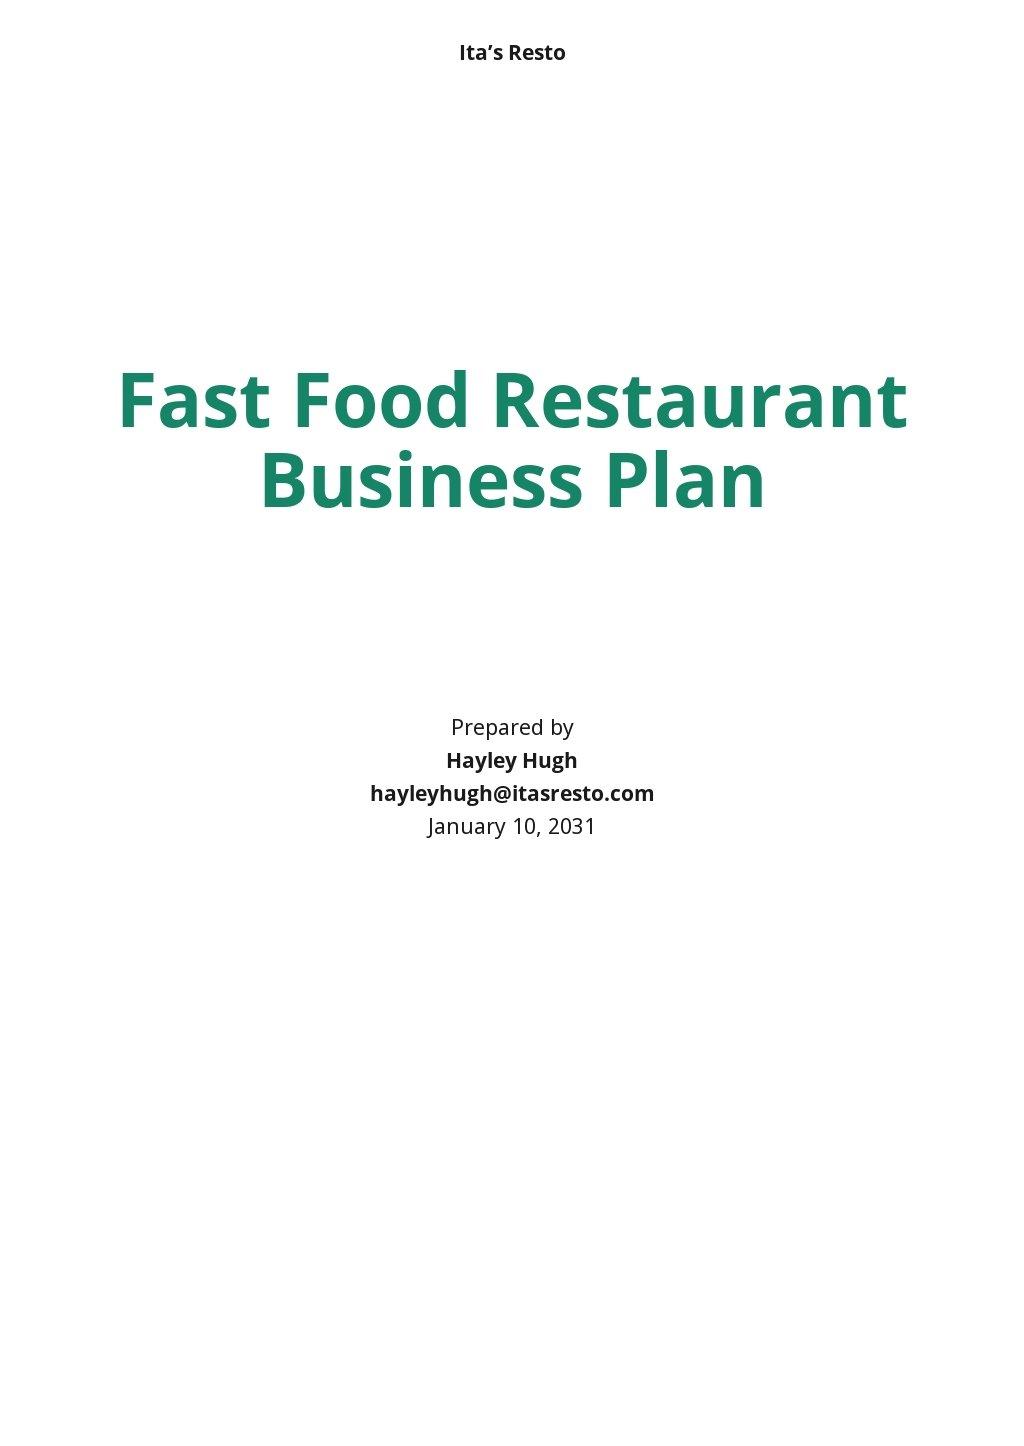 Fast Food Restaurant Business Plan Template.jpe